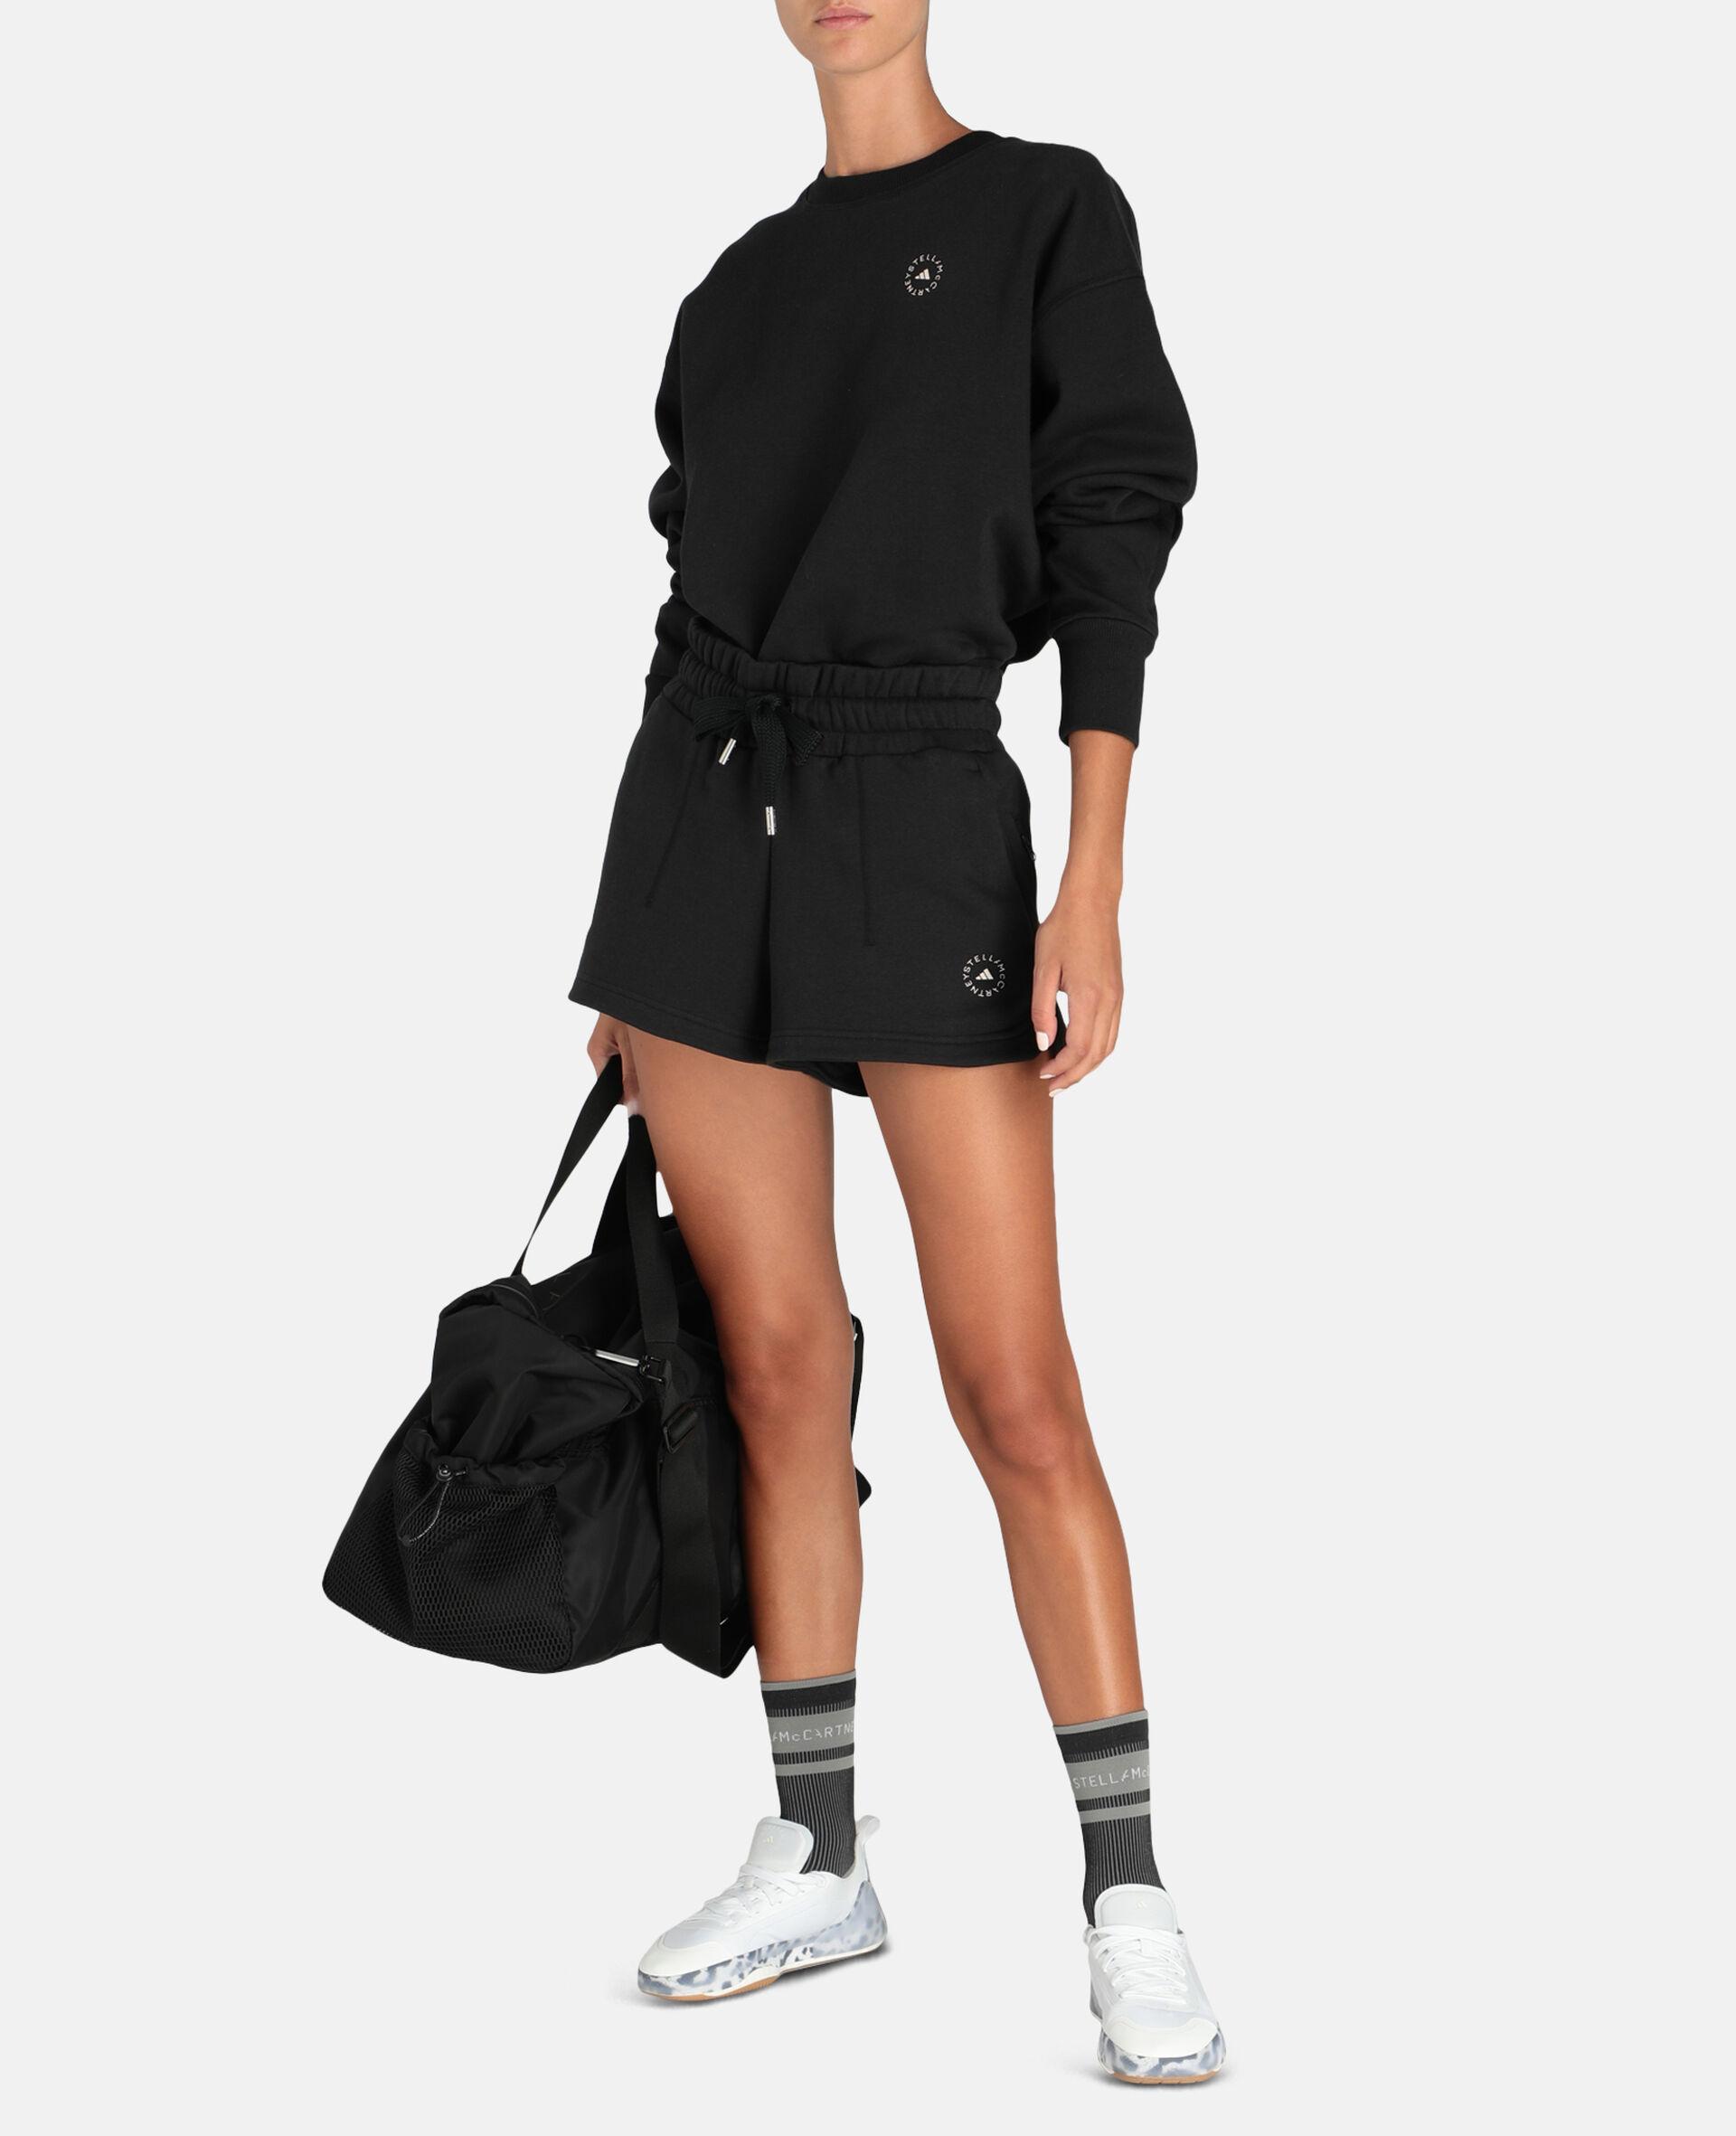 Schwarze Fleece-Sweat-Shorts-Schwarz-large image number 1